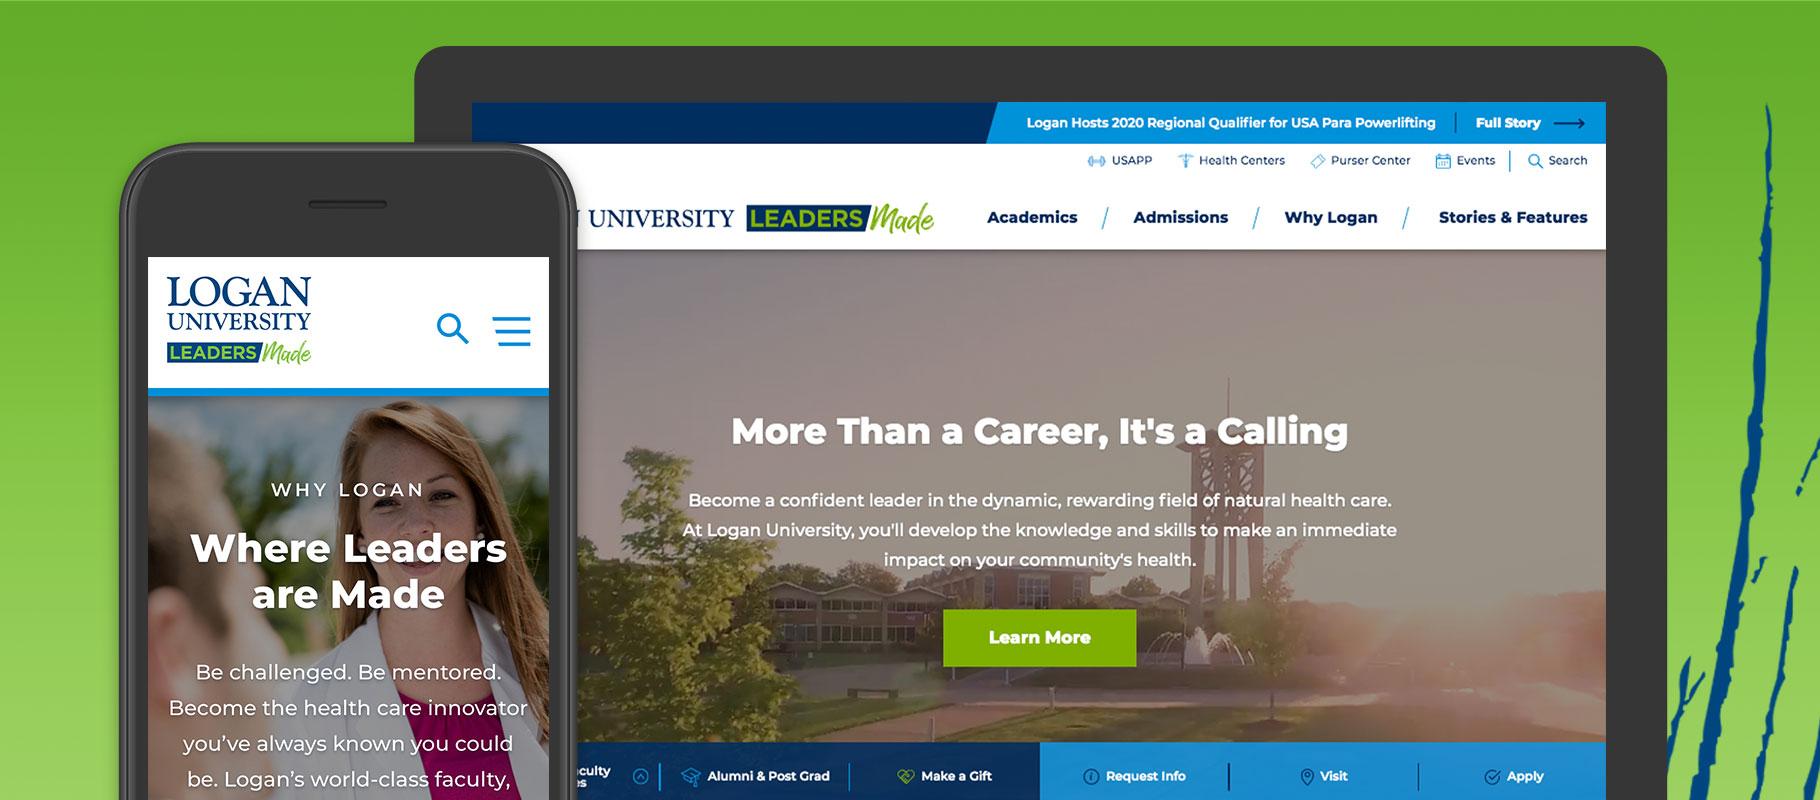 Logan University website design on a smartphone and a desktop computer